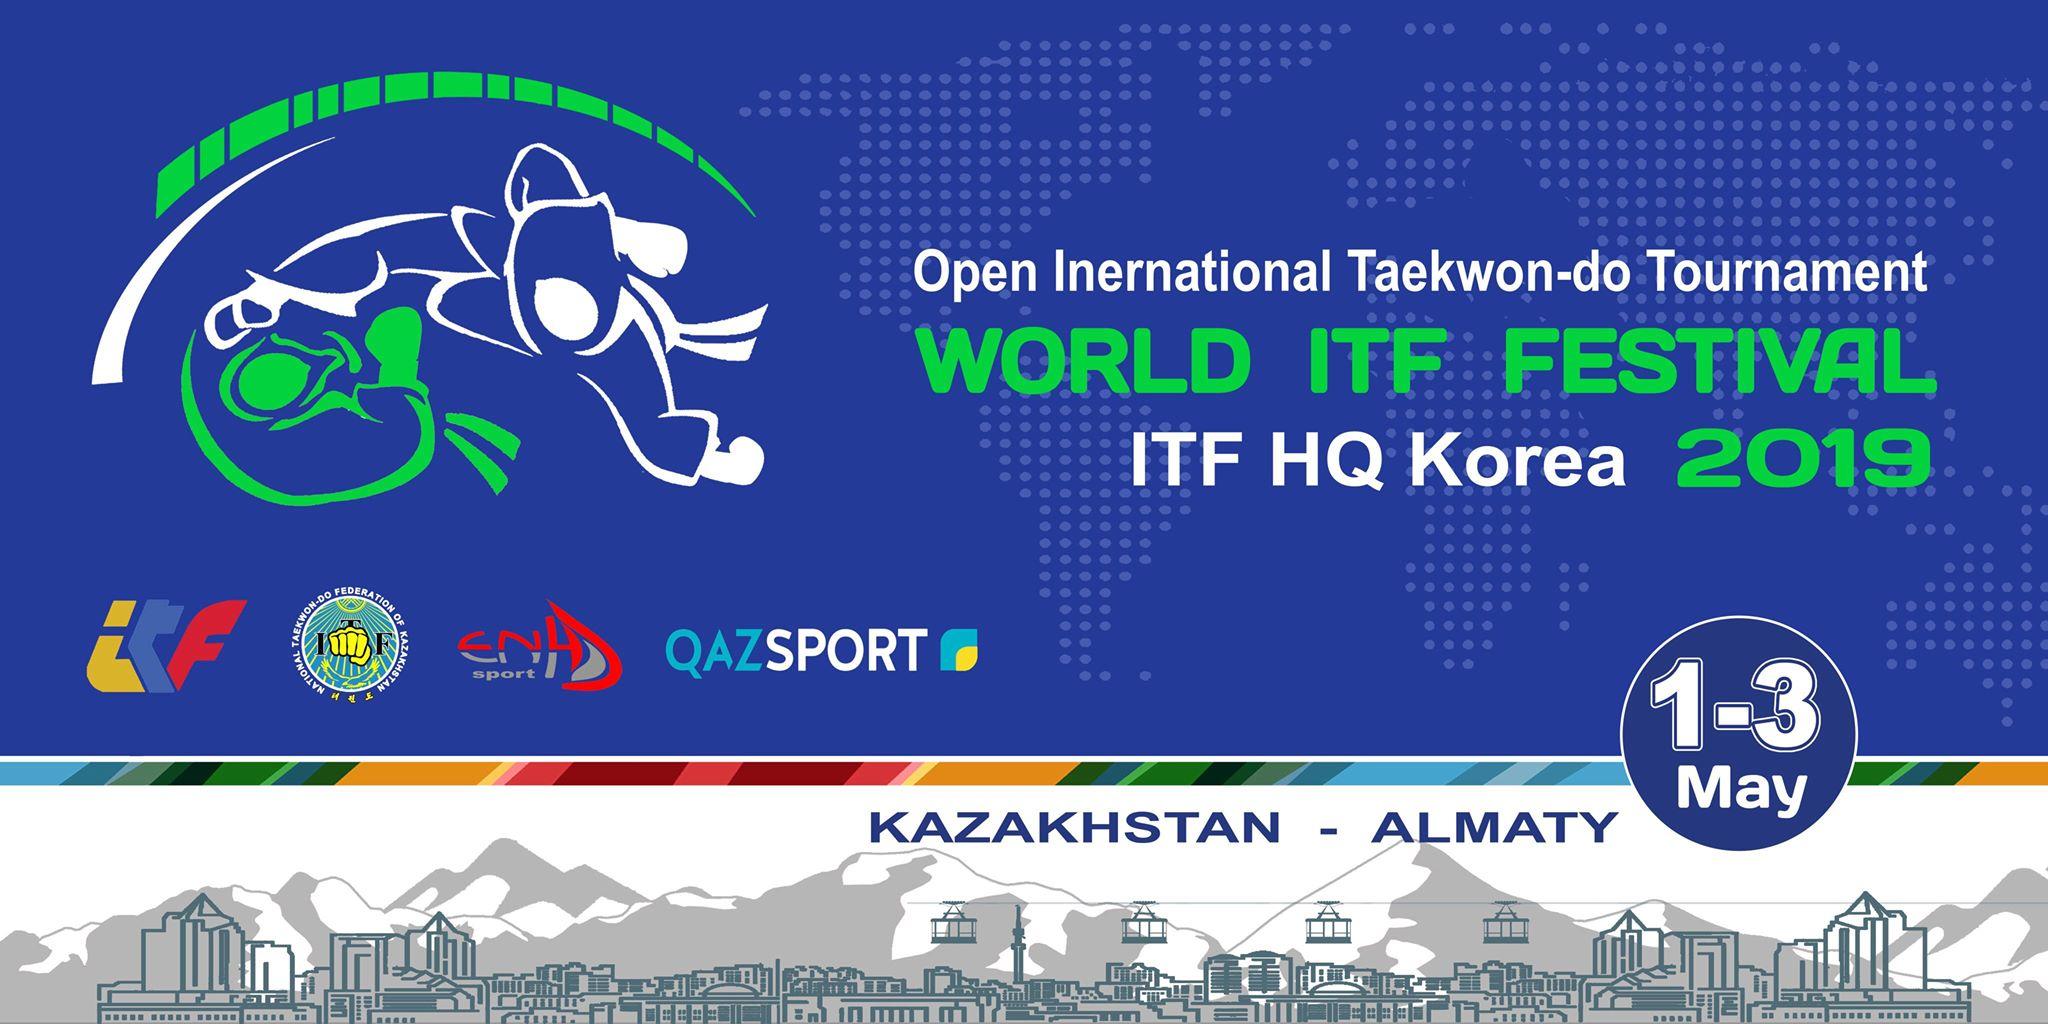 World ITF Festival 2019